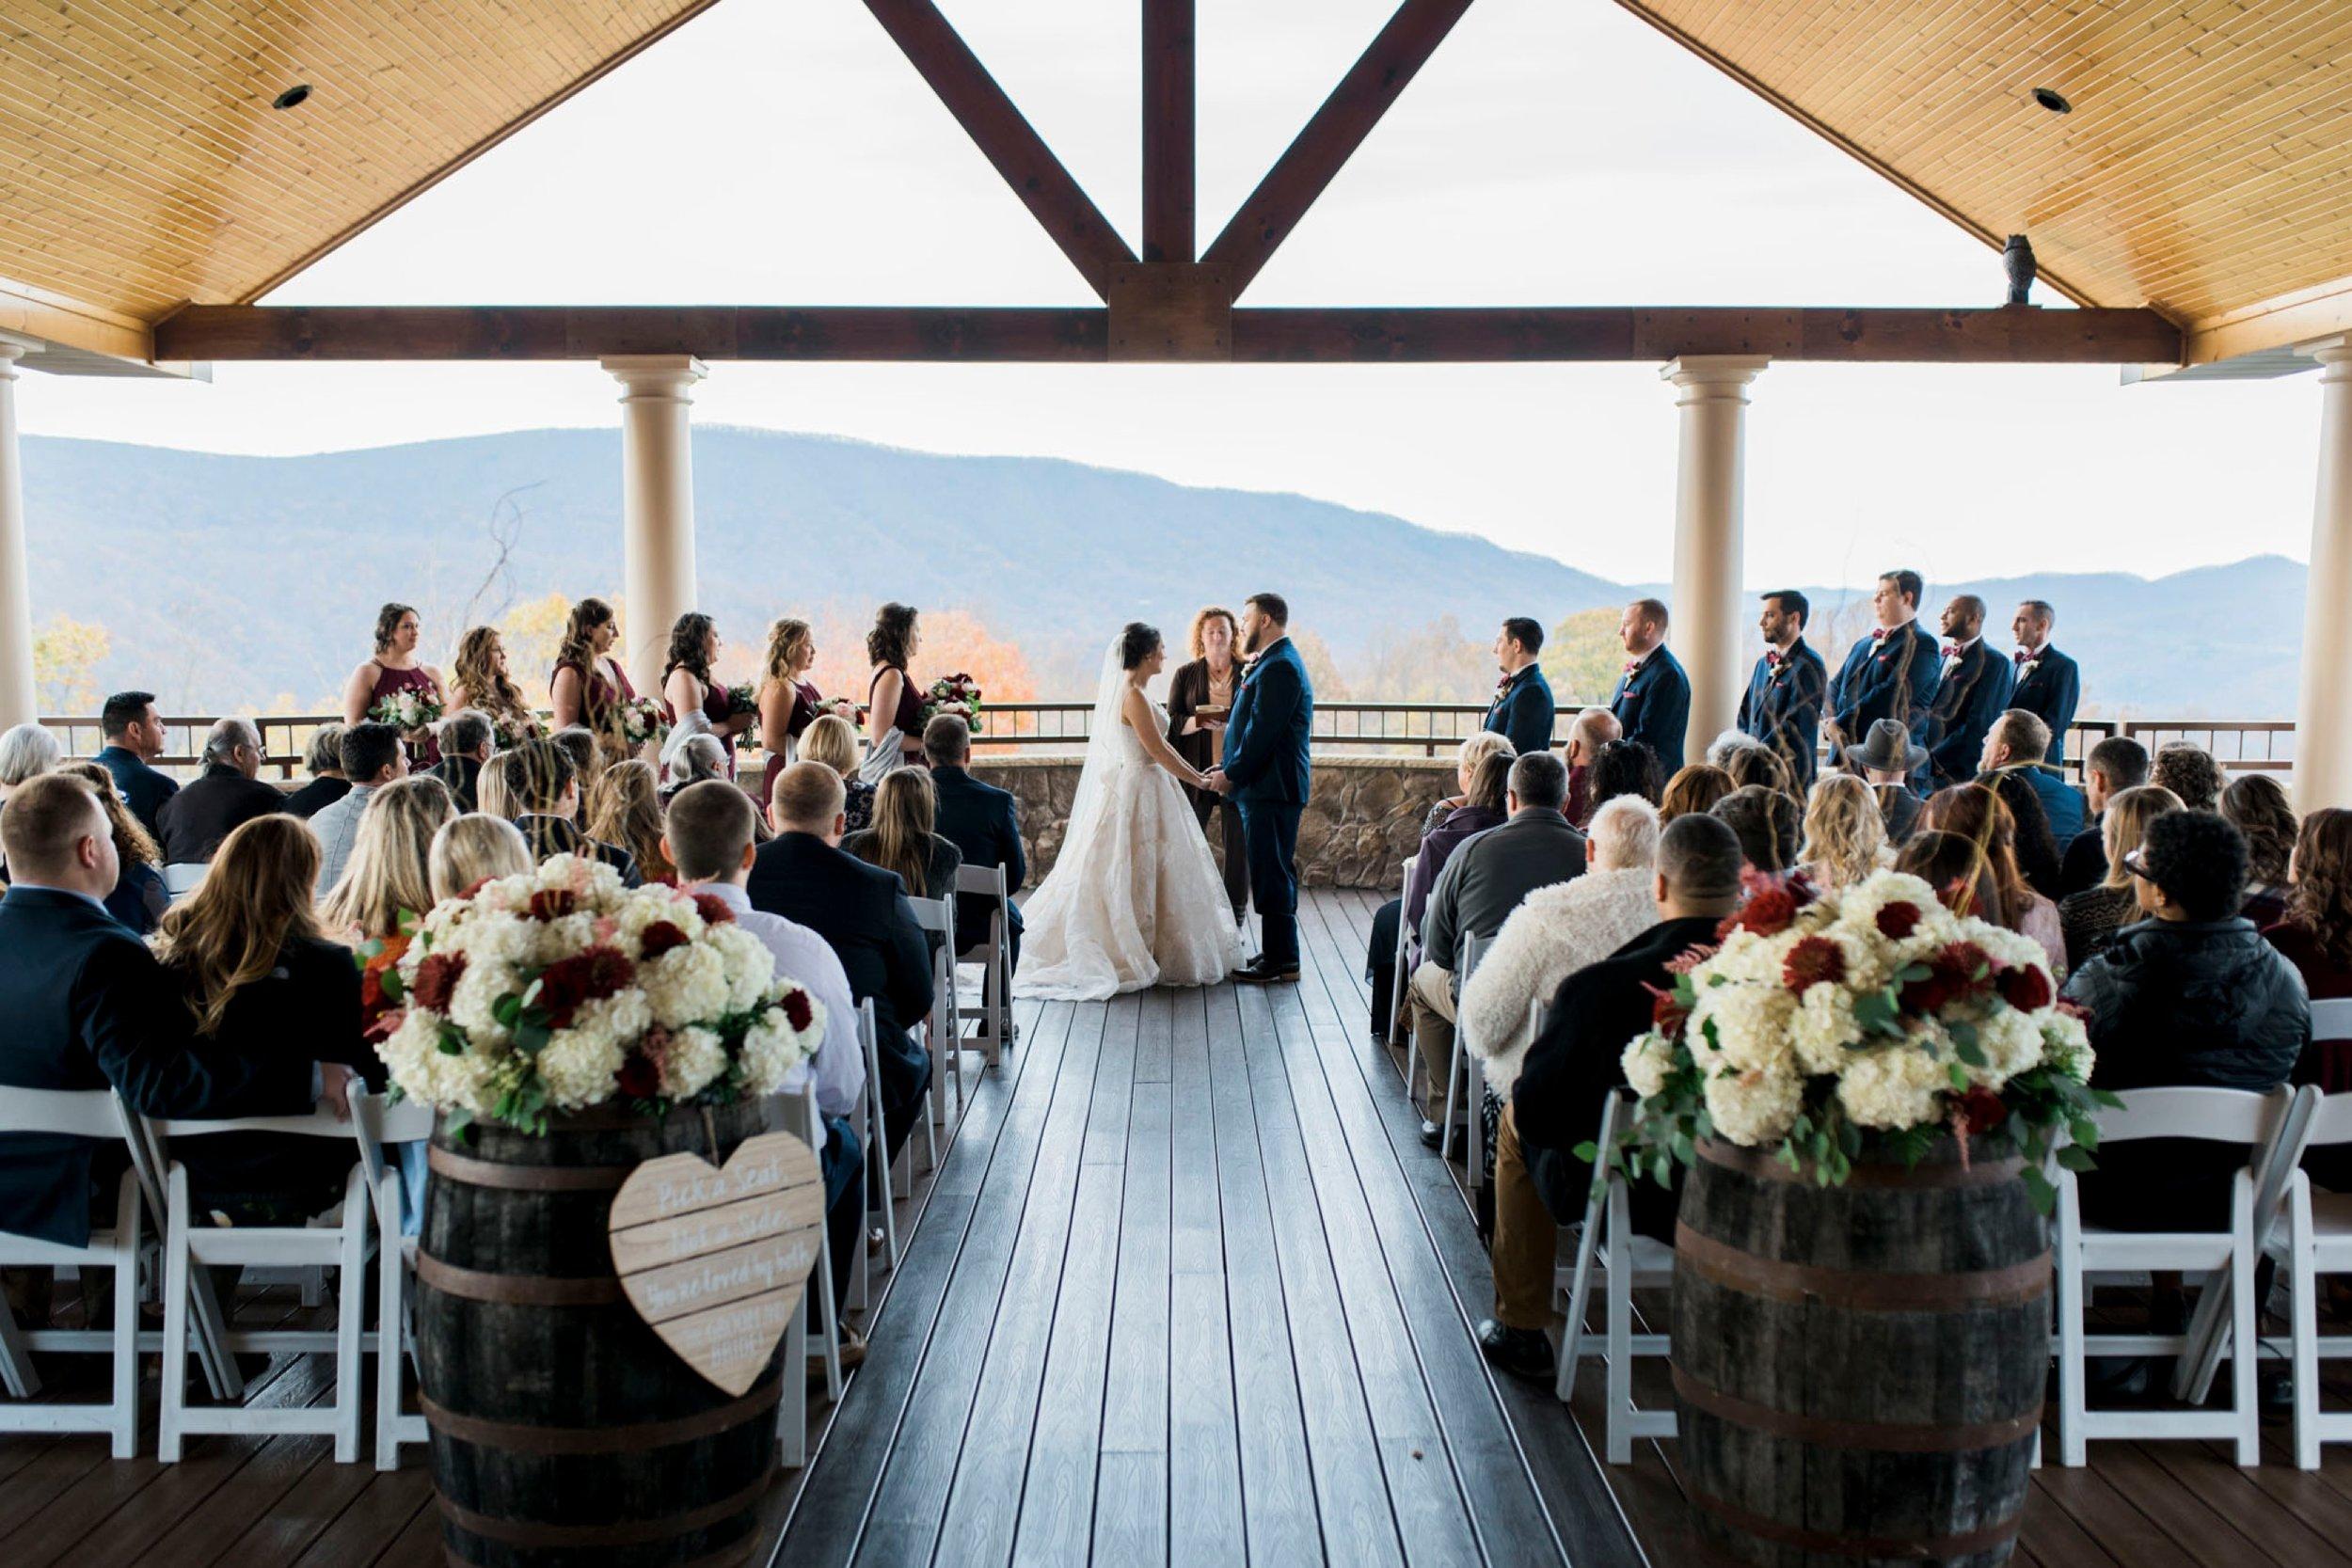 IrvineEstate_LexingtonVA_Wedding_FallWedding_VirginiaWeddingPhotographer 60.jpg